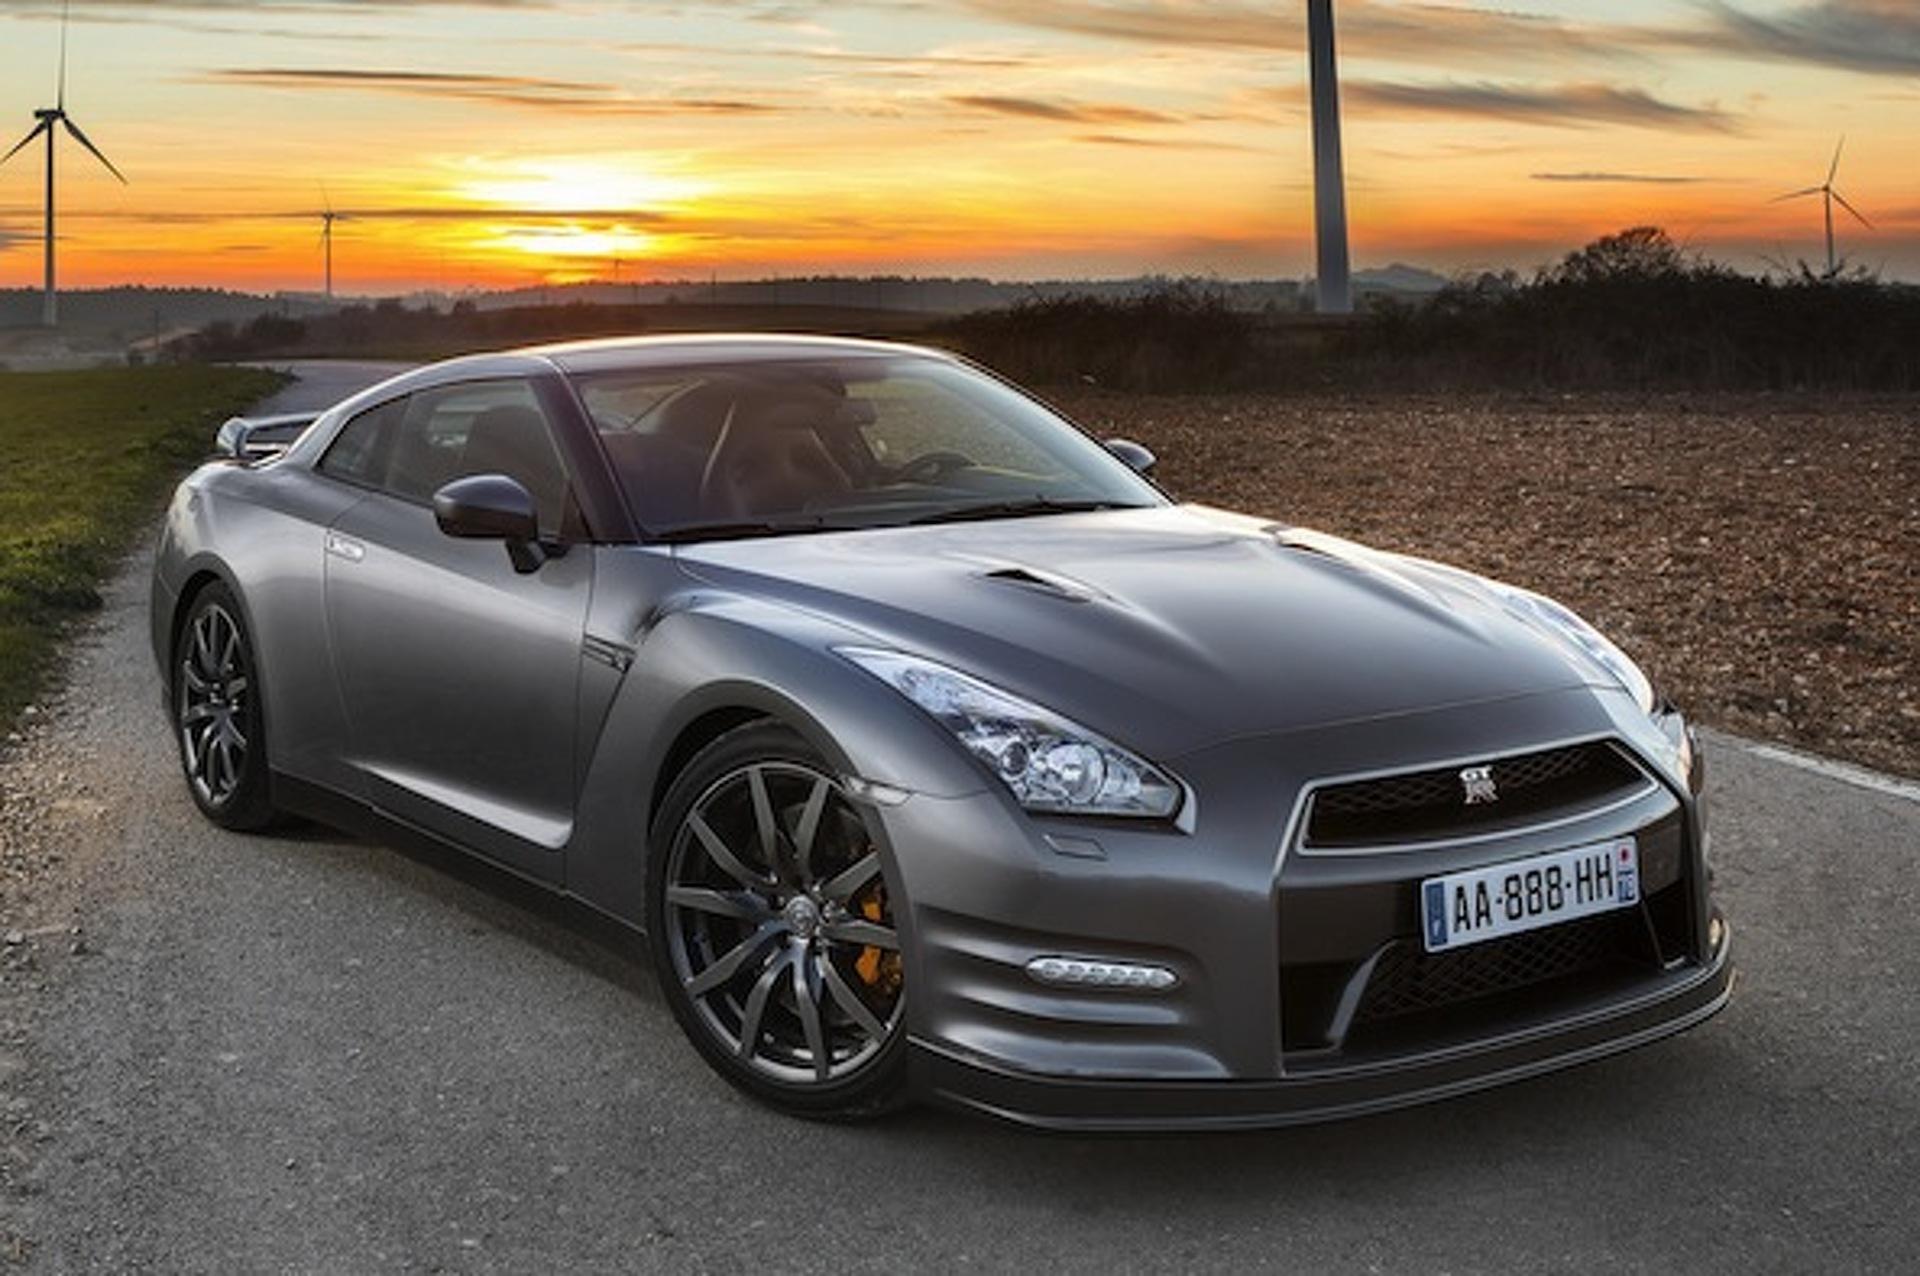 Confirmed: Nissan GT-R Going Hybrid